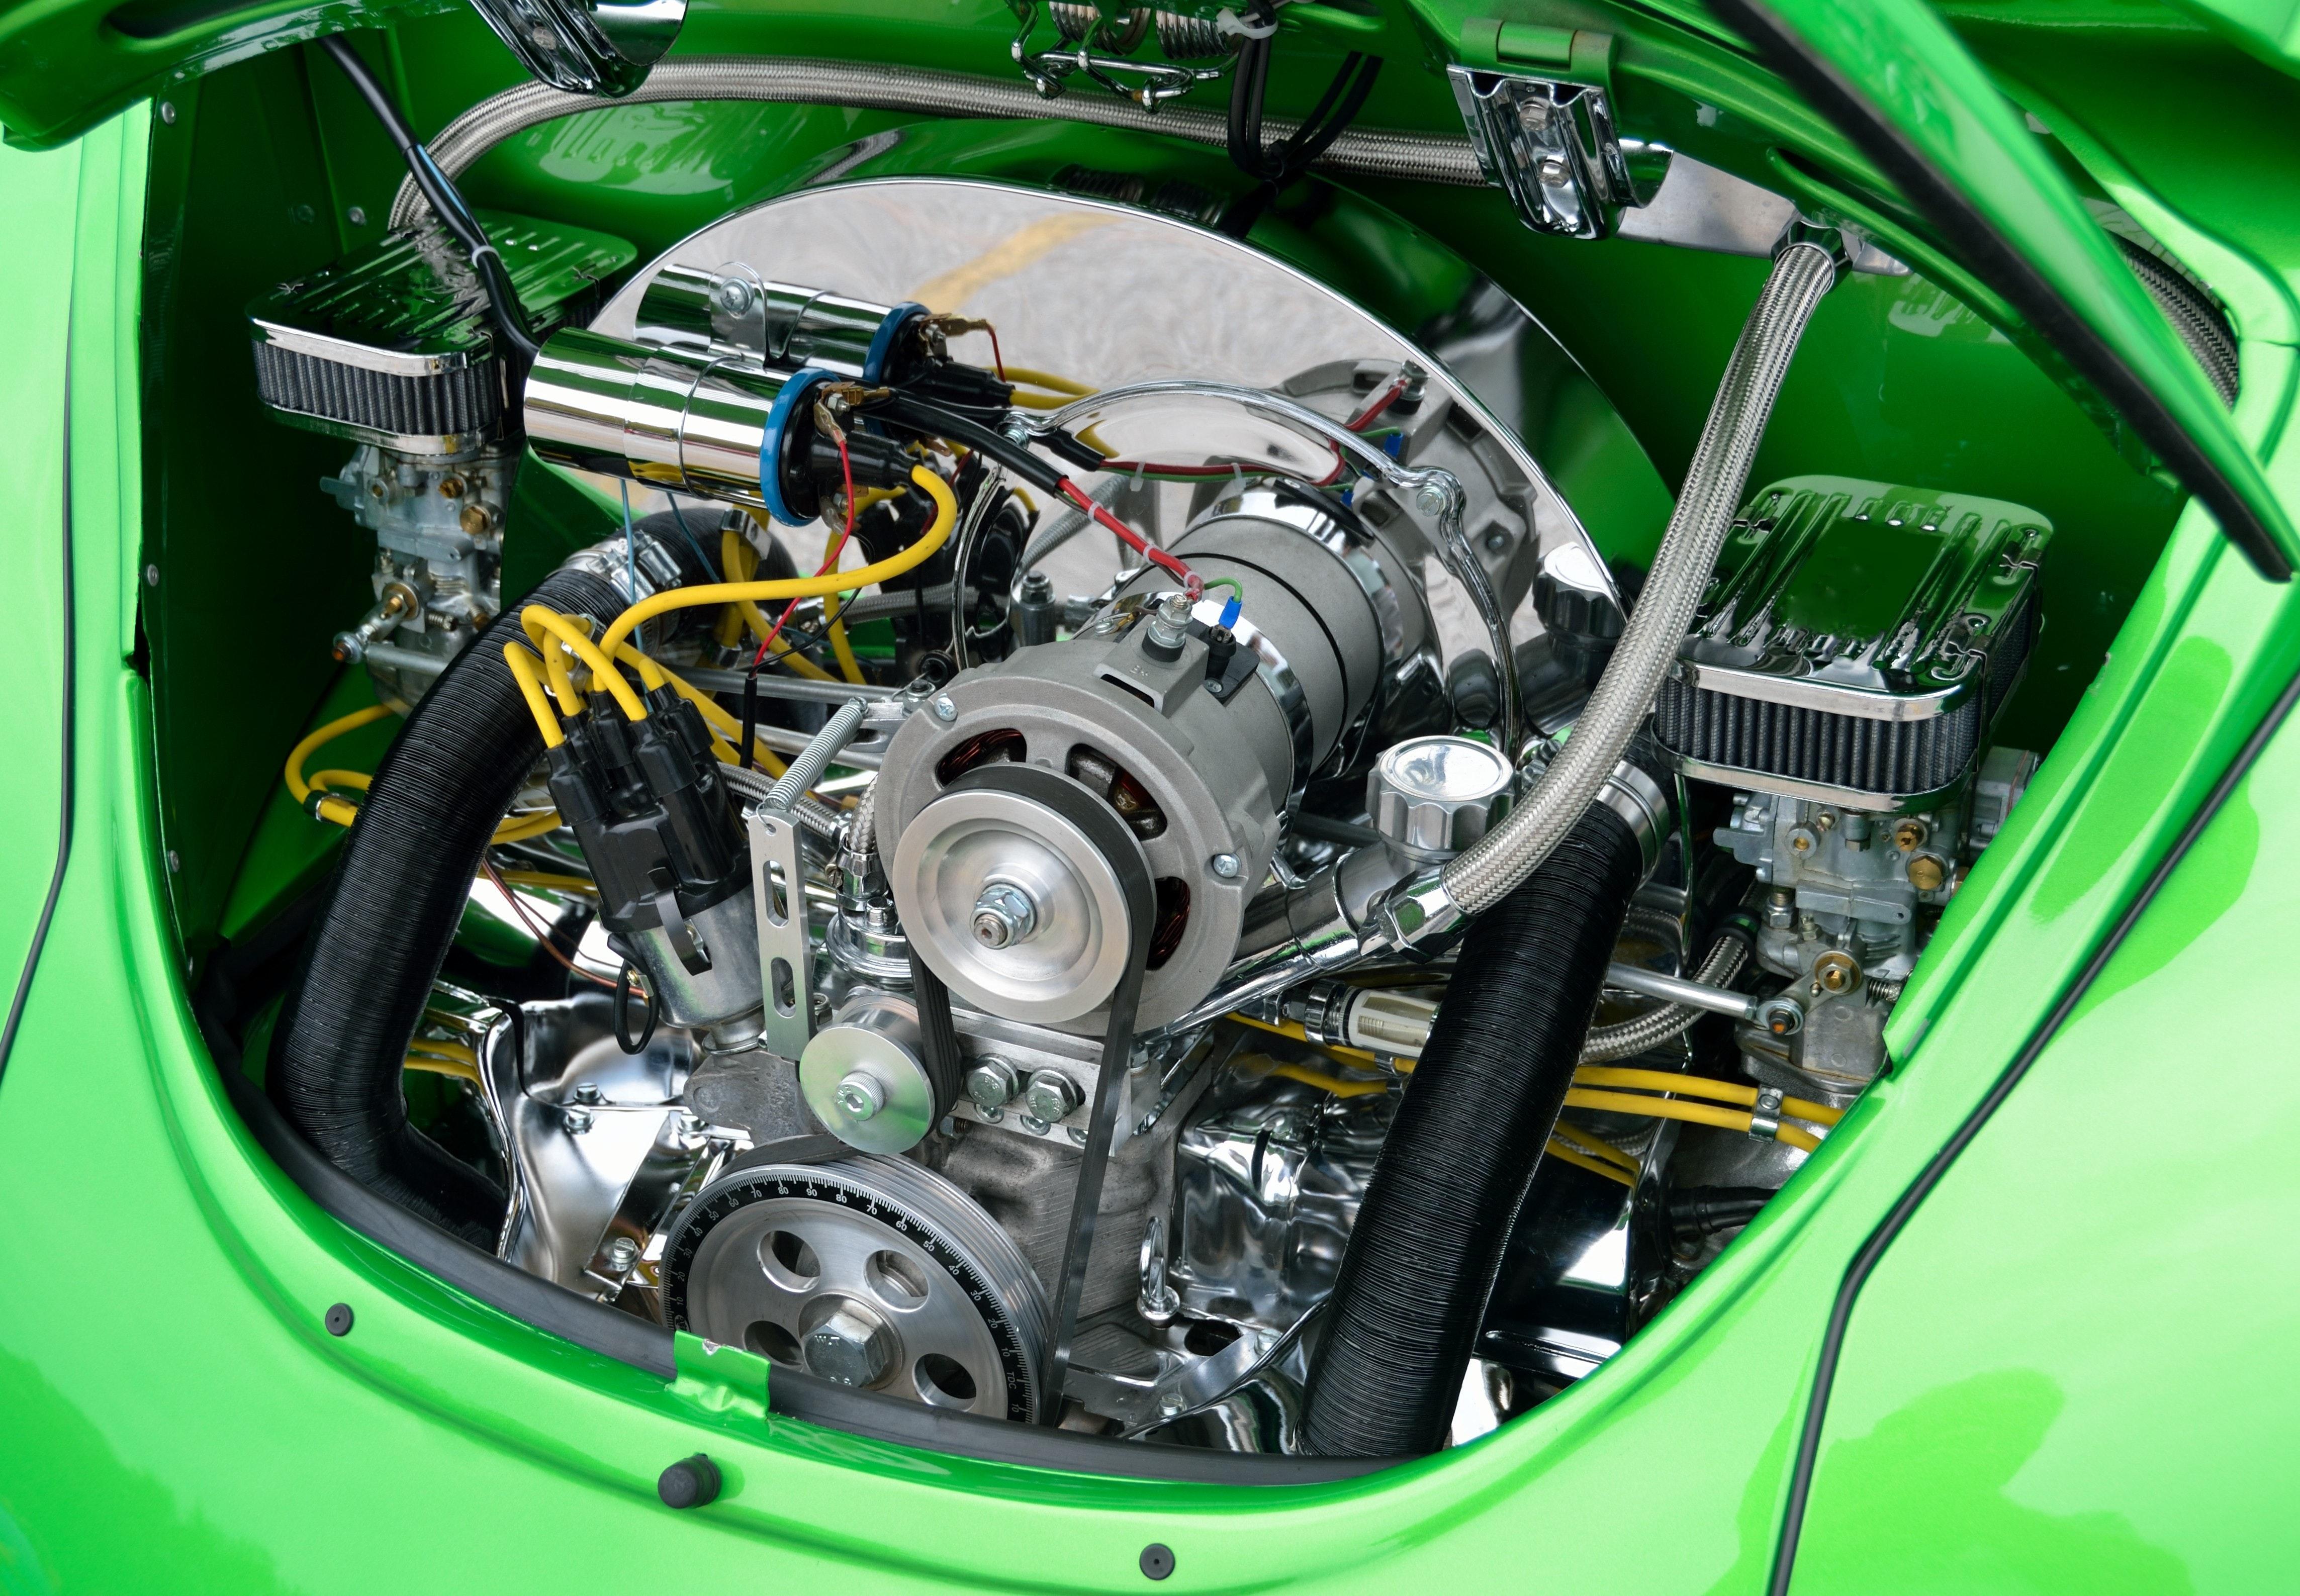 Free stock photos of engine · Pexels